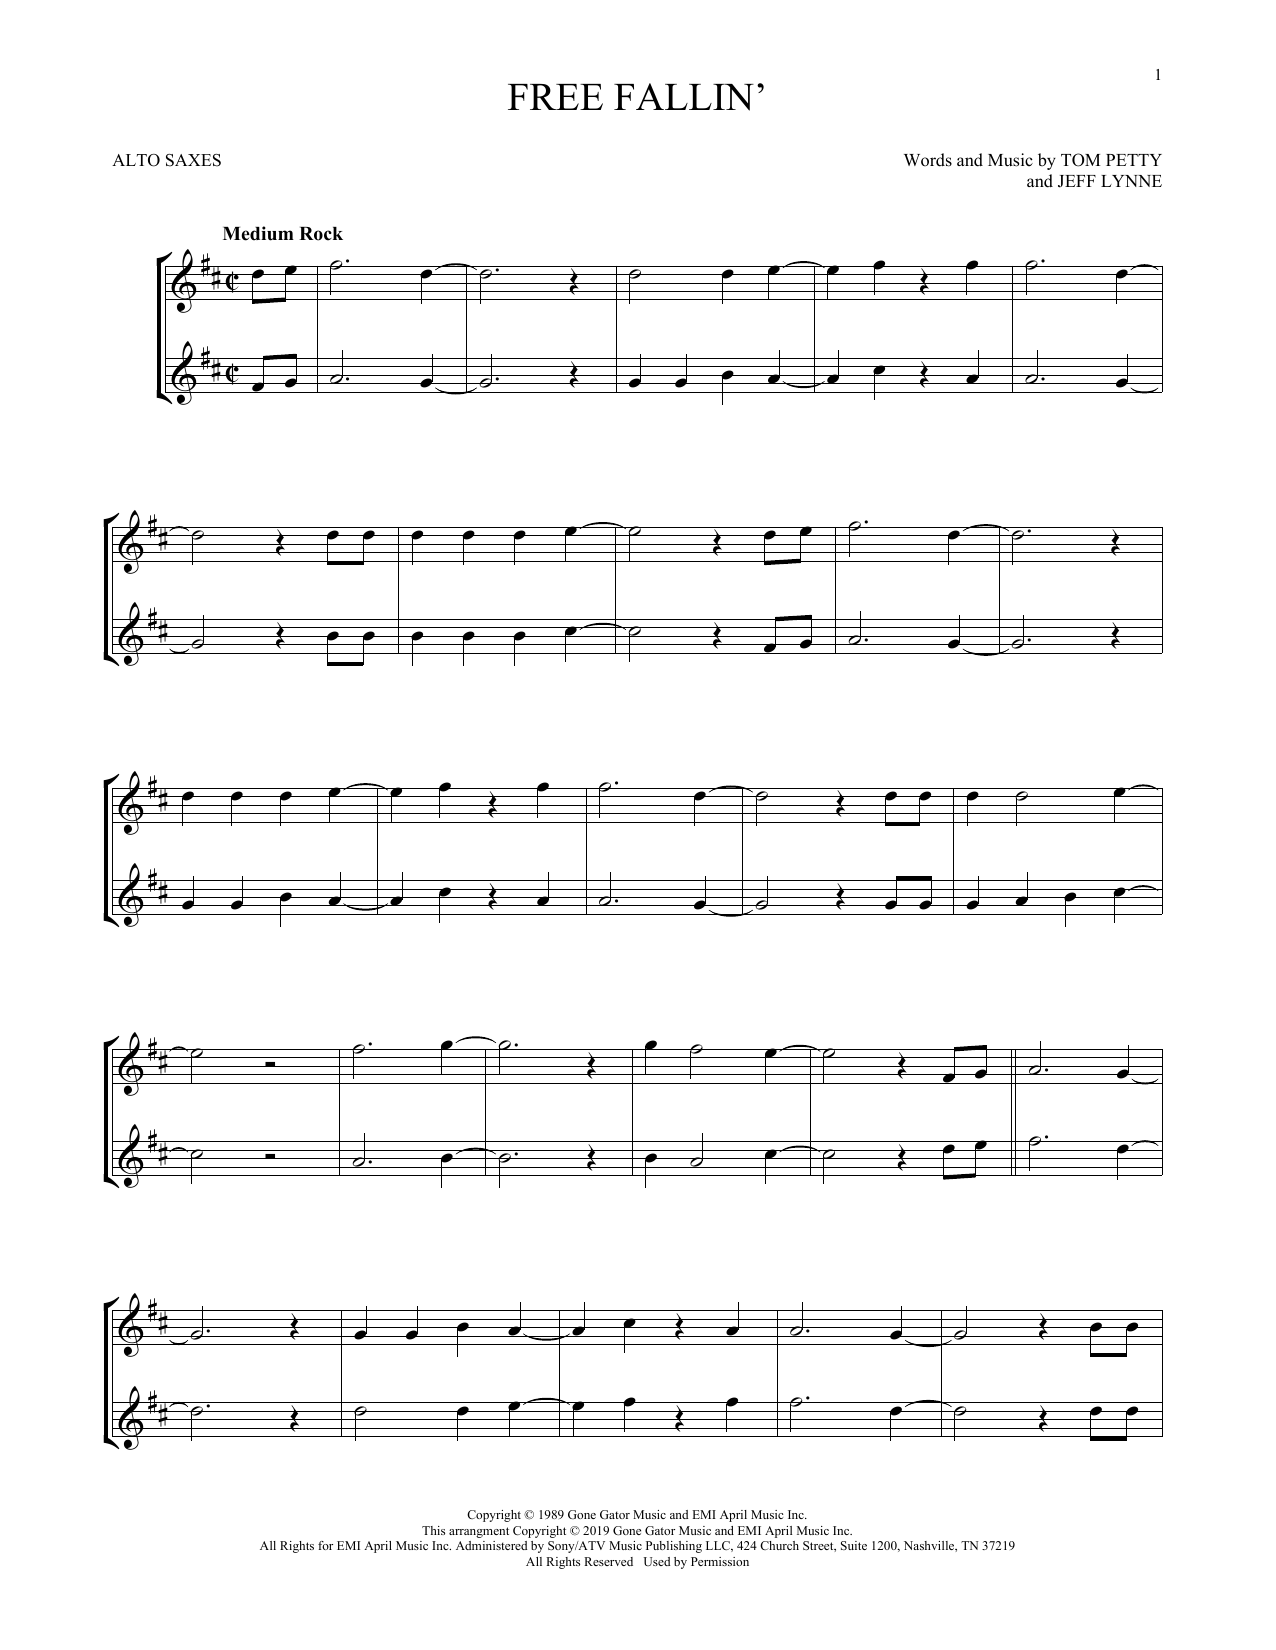 Free Fallin' (Alto Sax Duet)